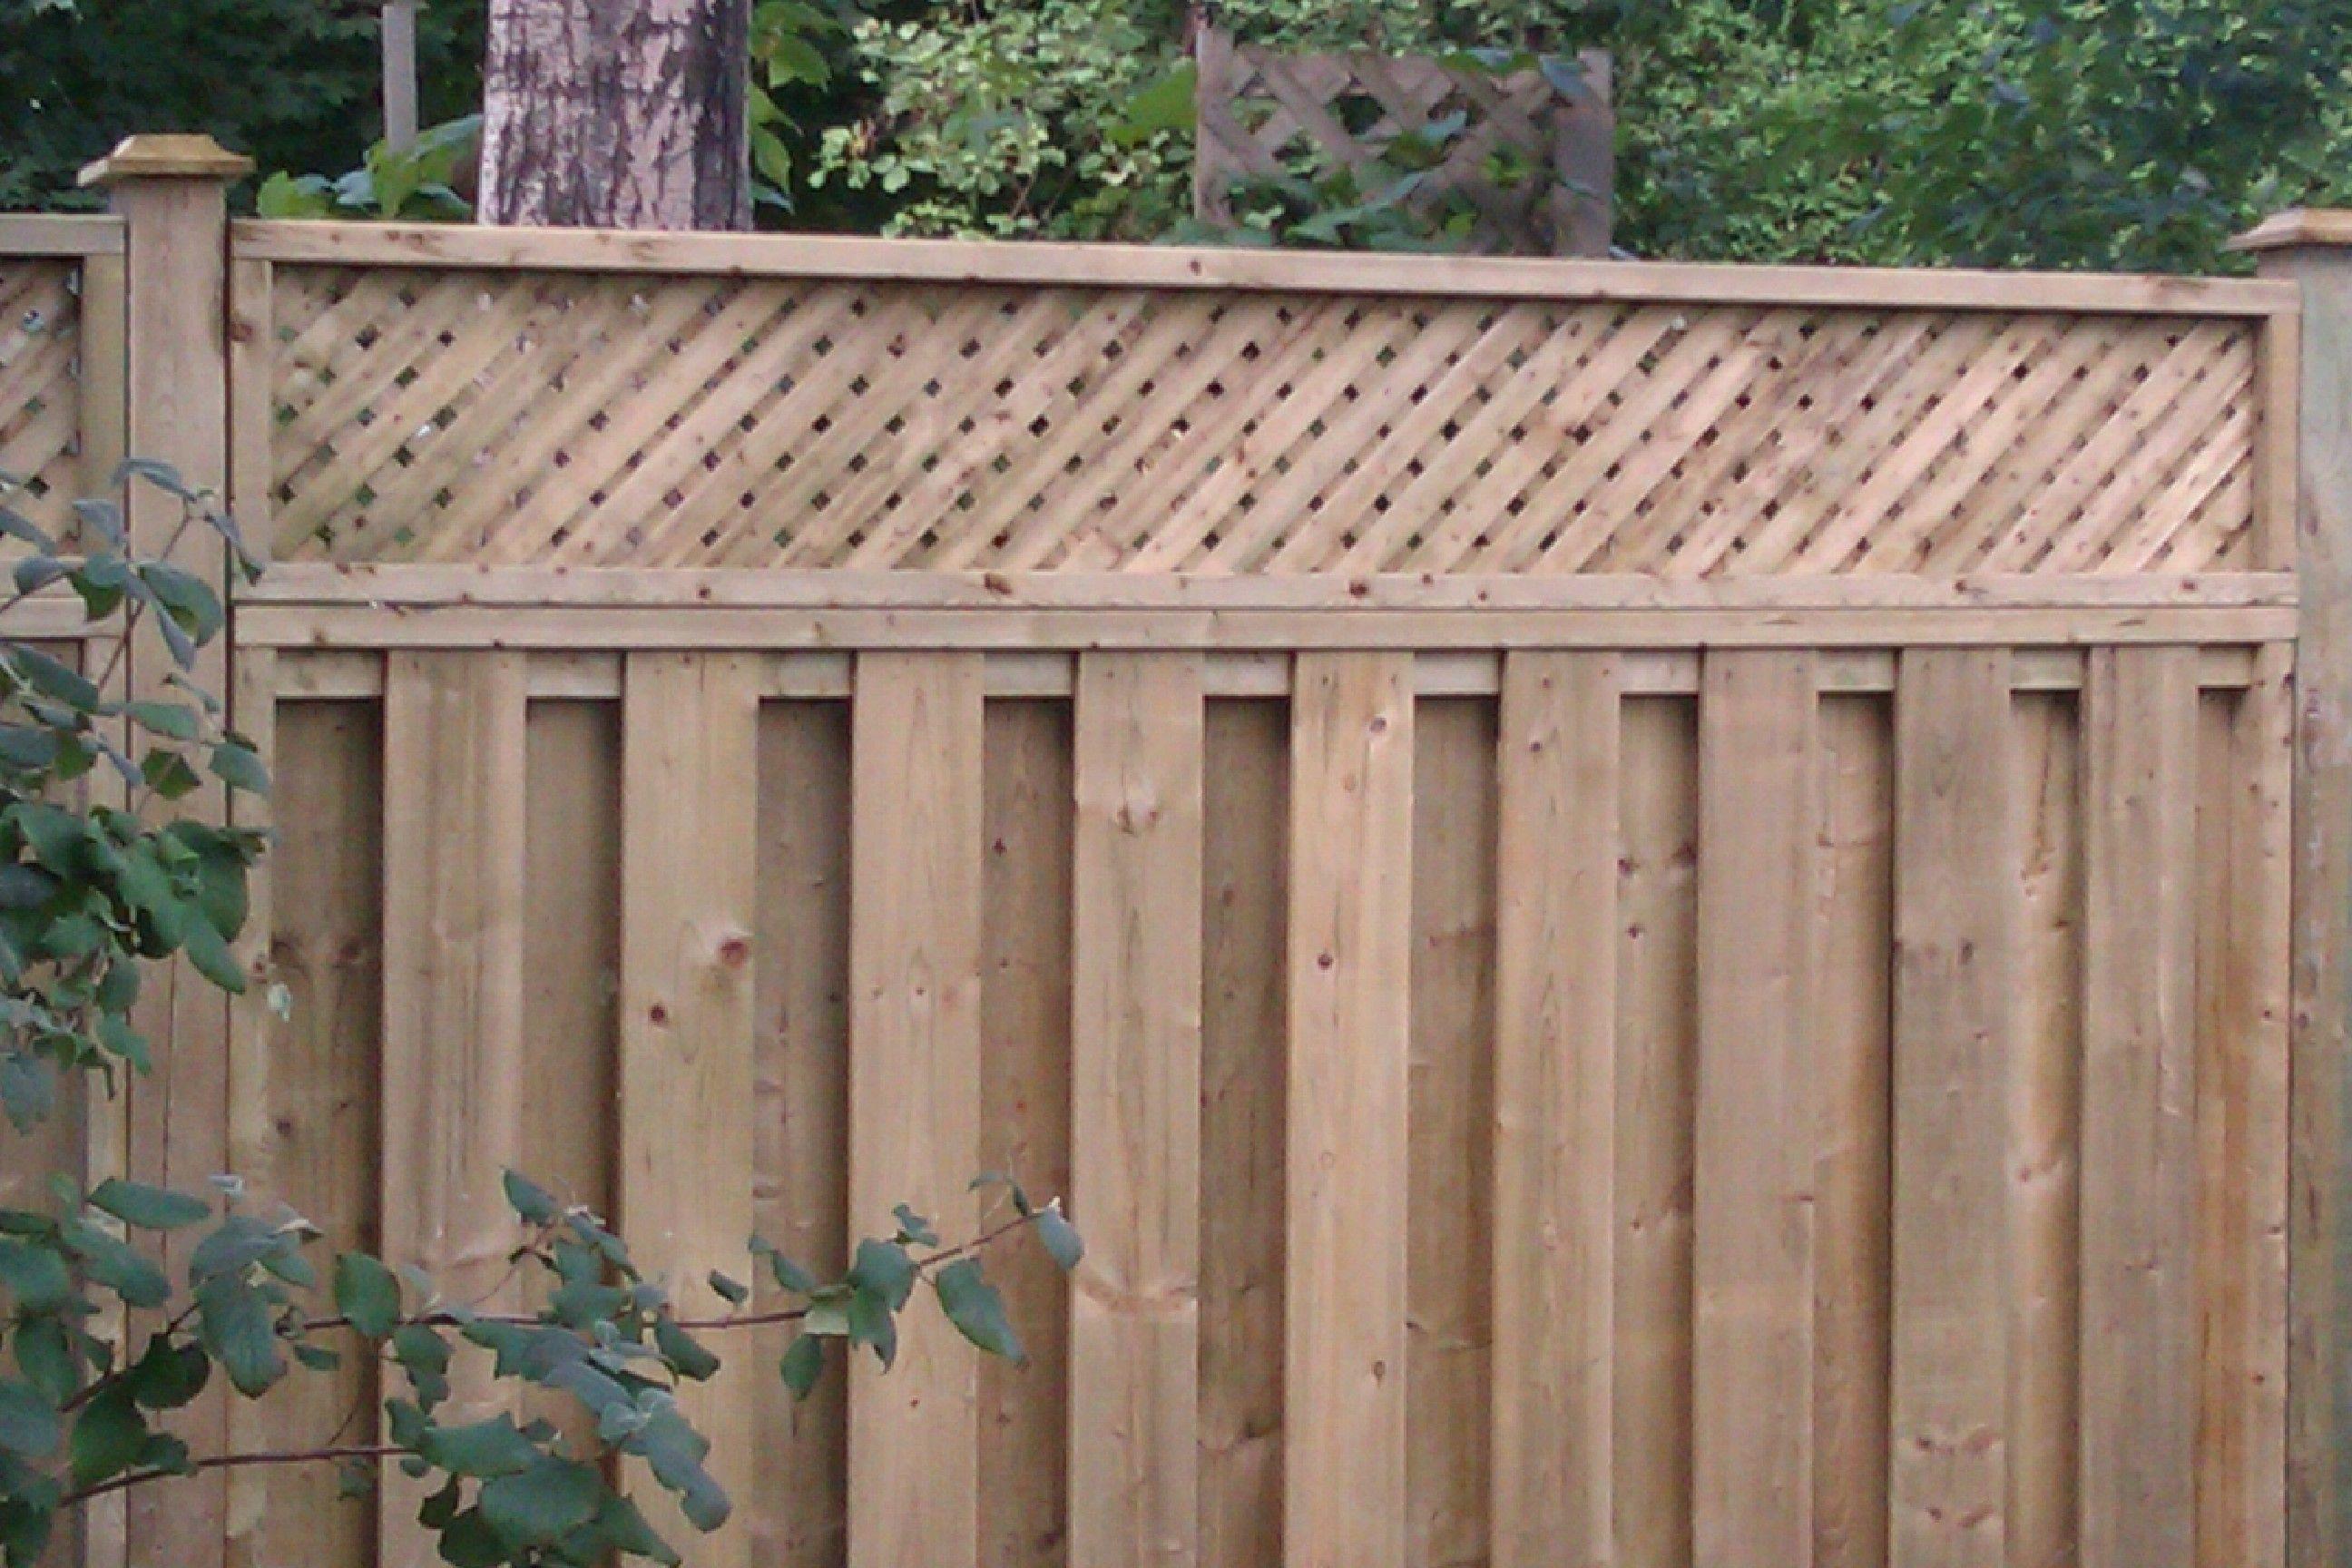 Good Neighbor Fence In 2019 Good Neighbor Fence Fence